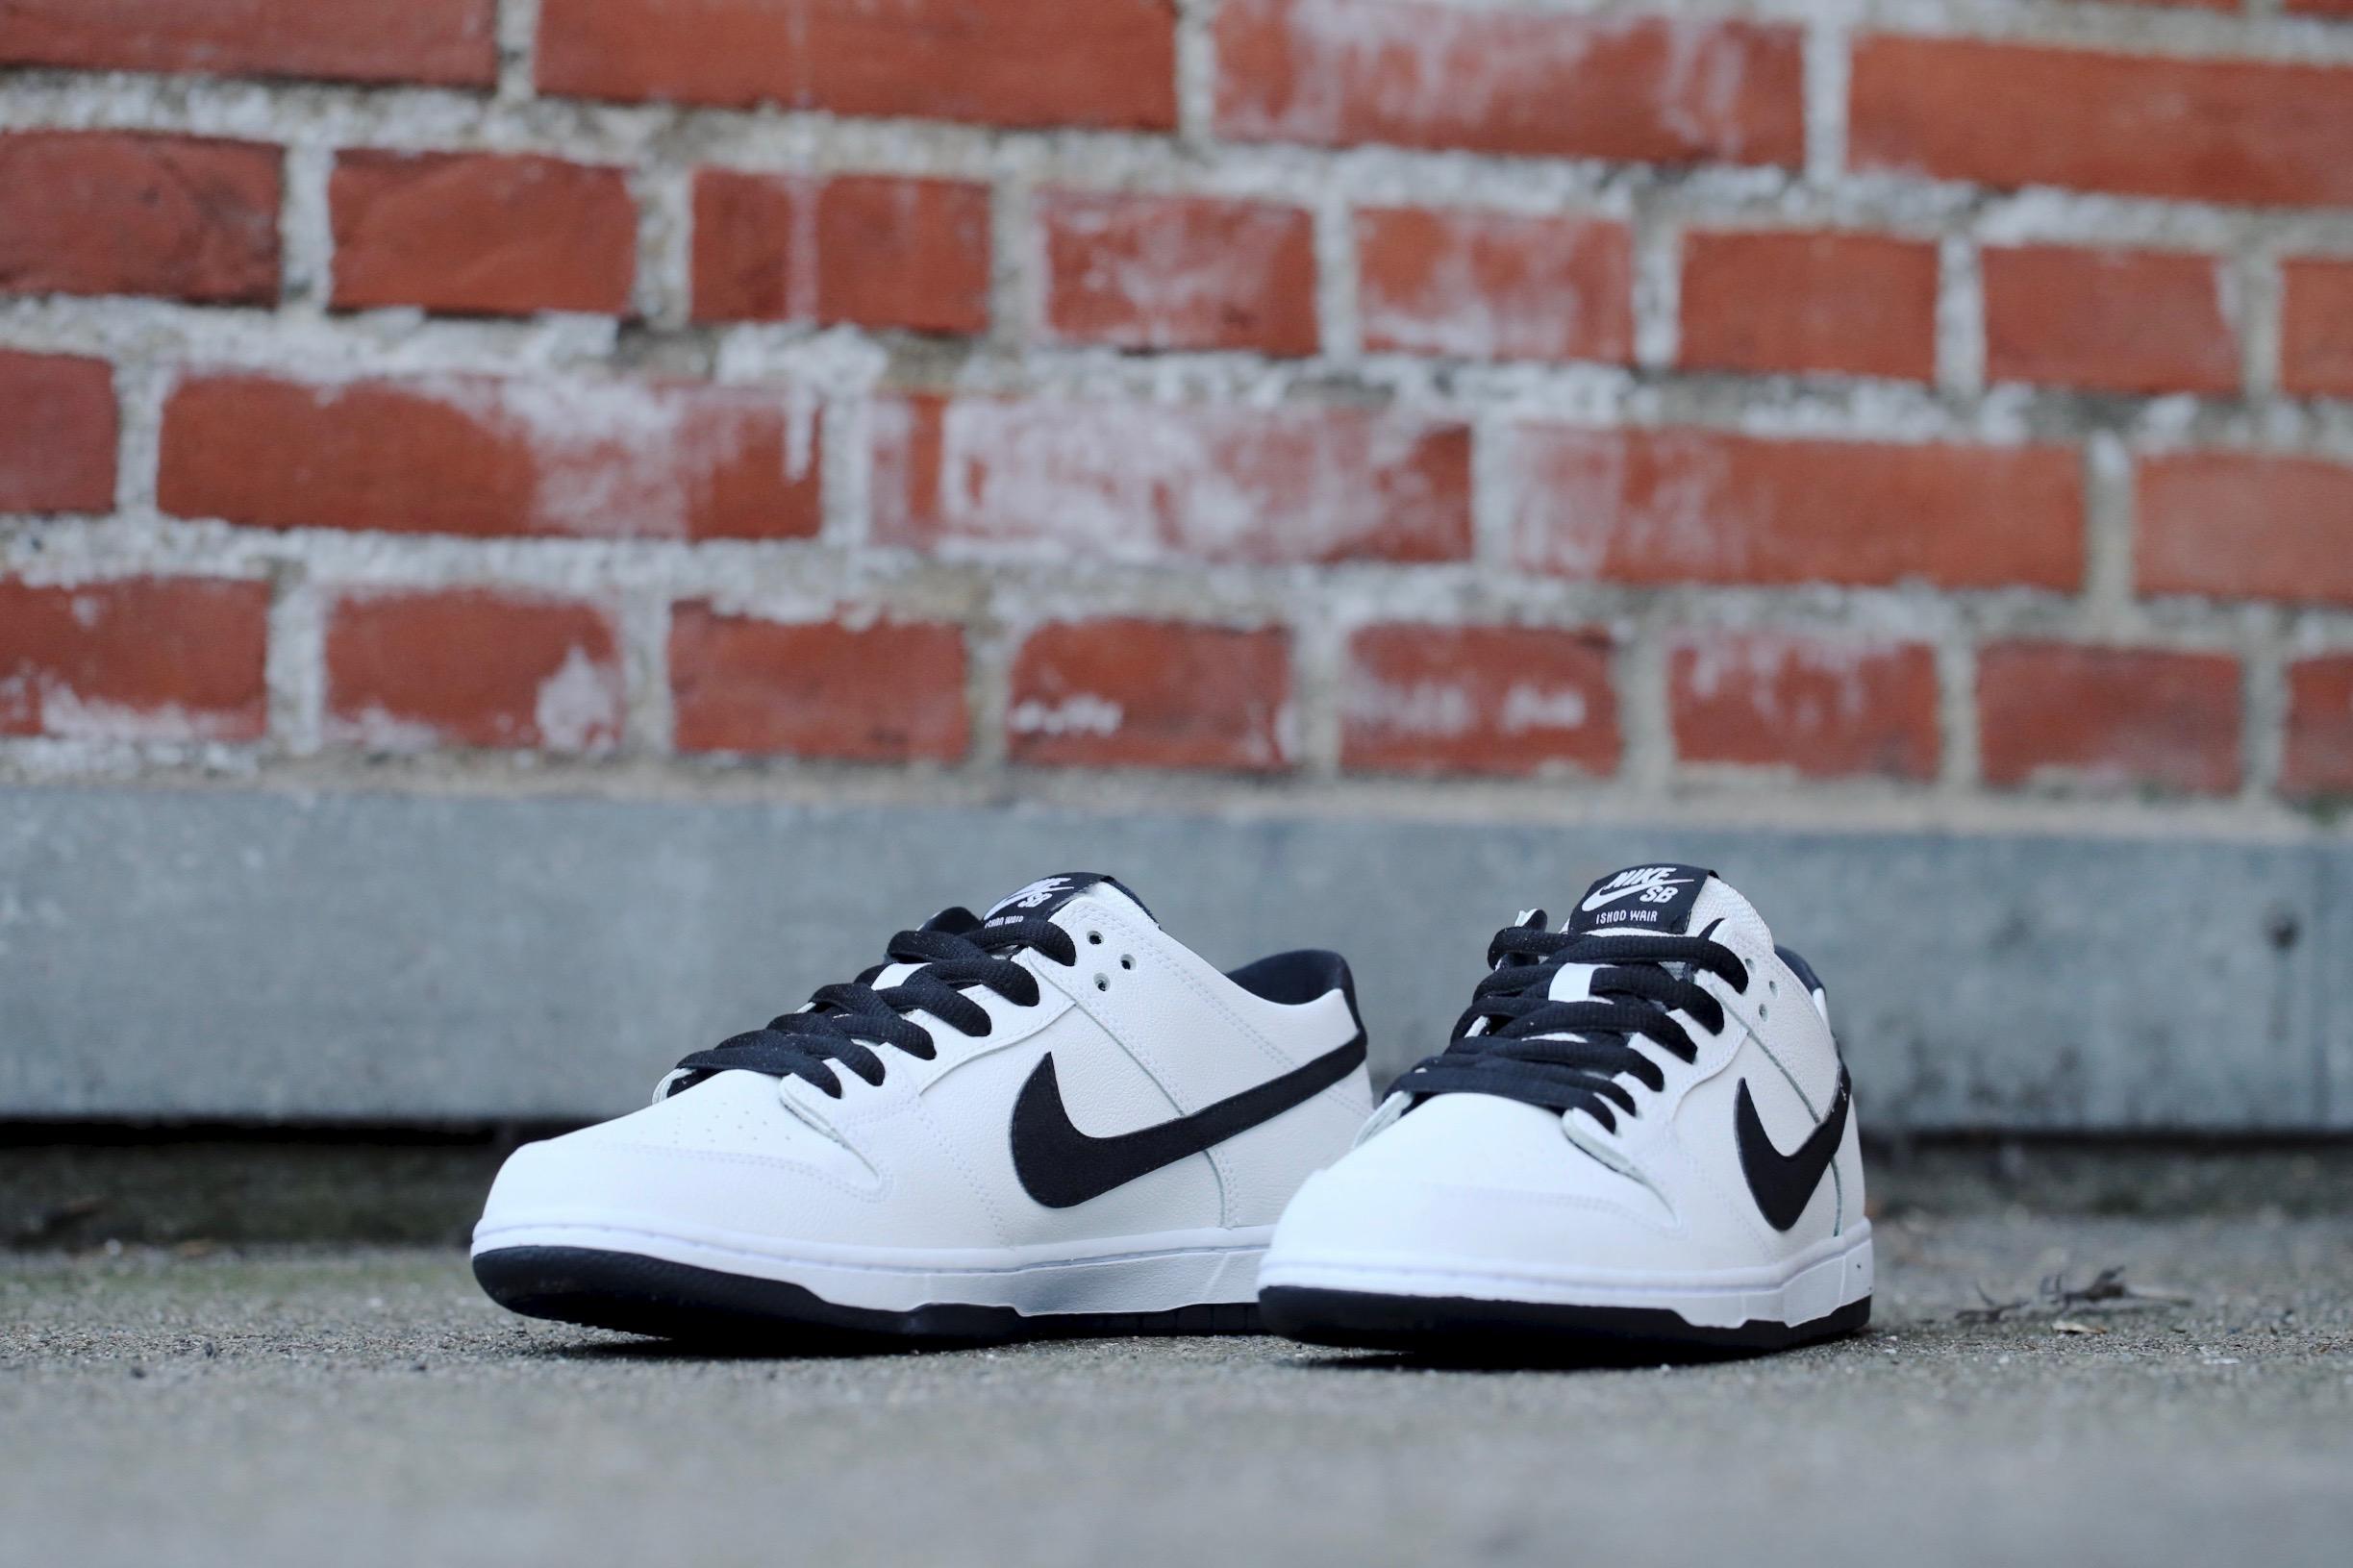 Nike Sb Dunk Lav Pro Ishod Wair Qsi 6dEF26x9f